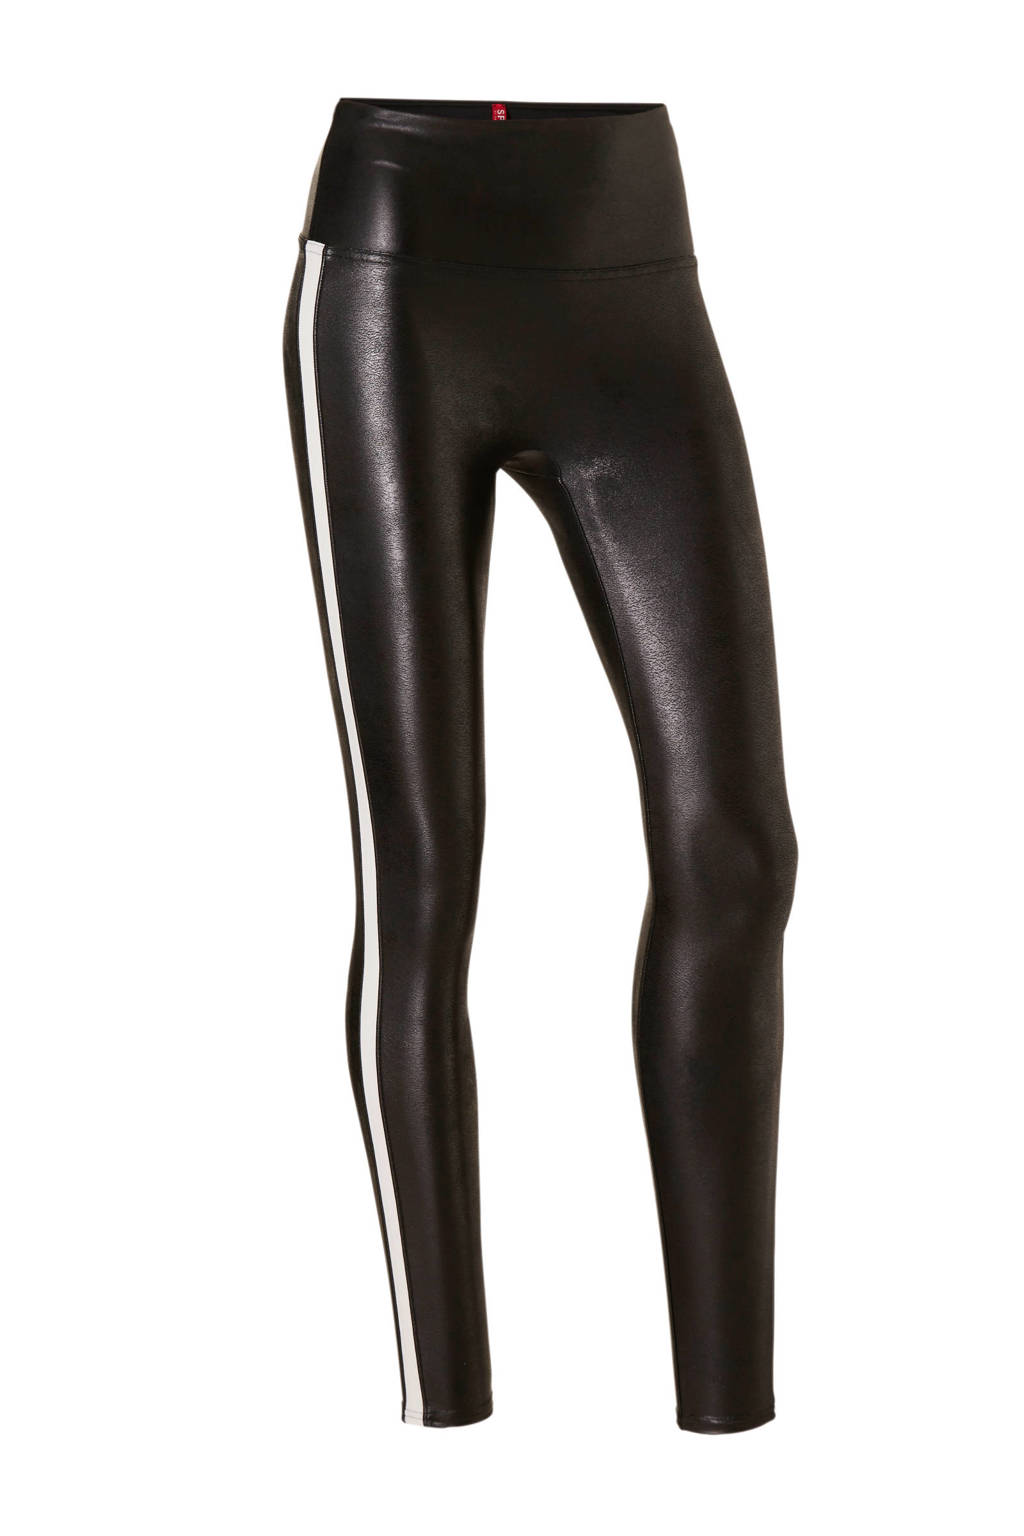 SPANX corrigerende legging zwart, Zwart/wit